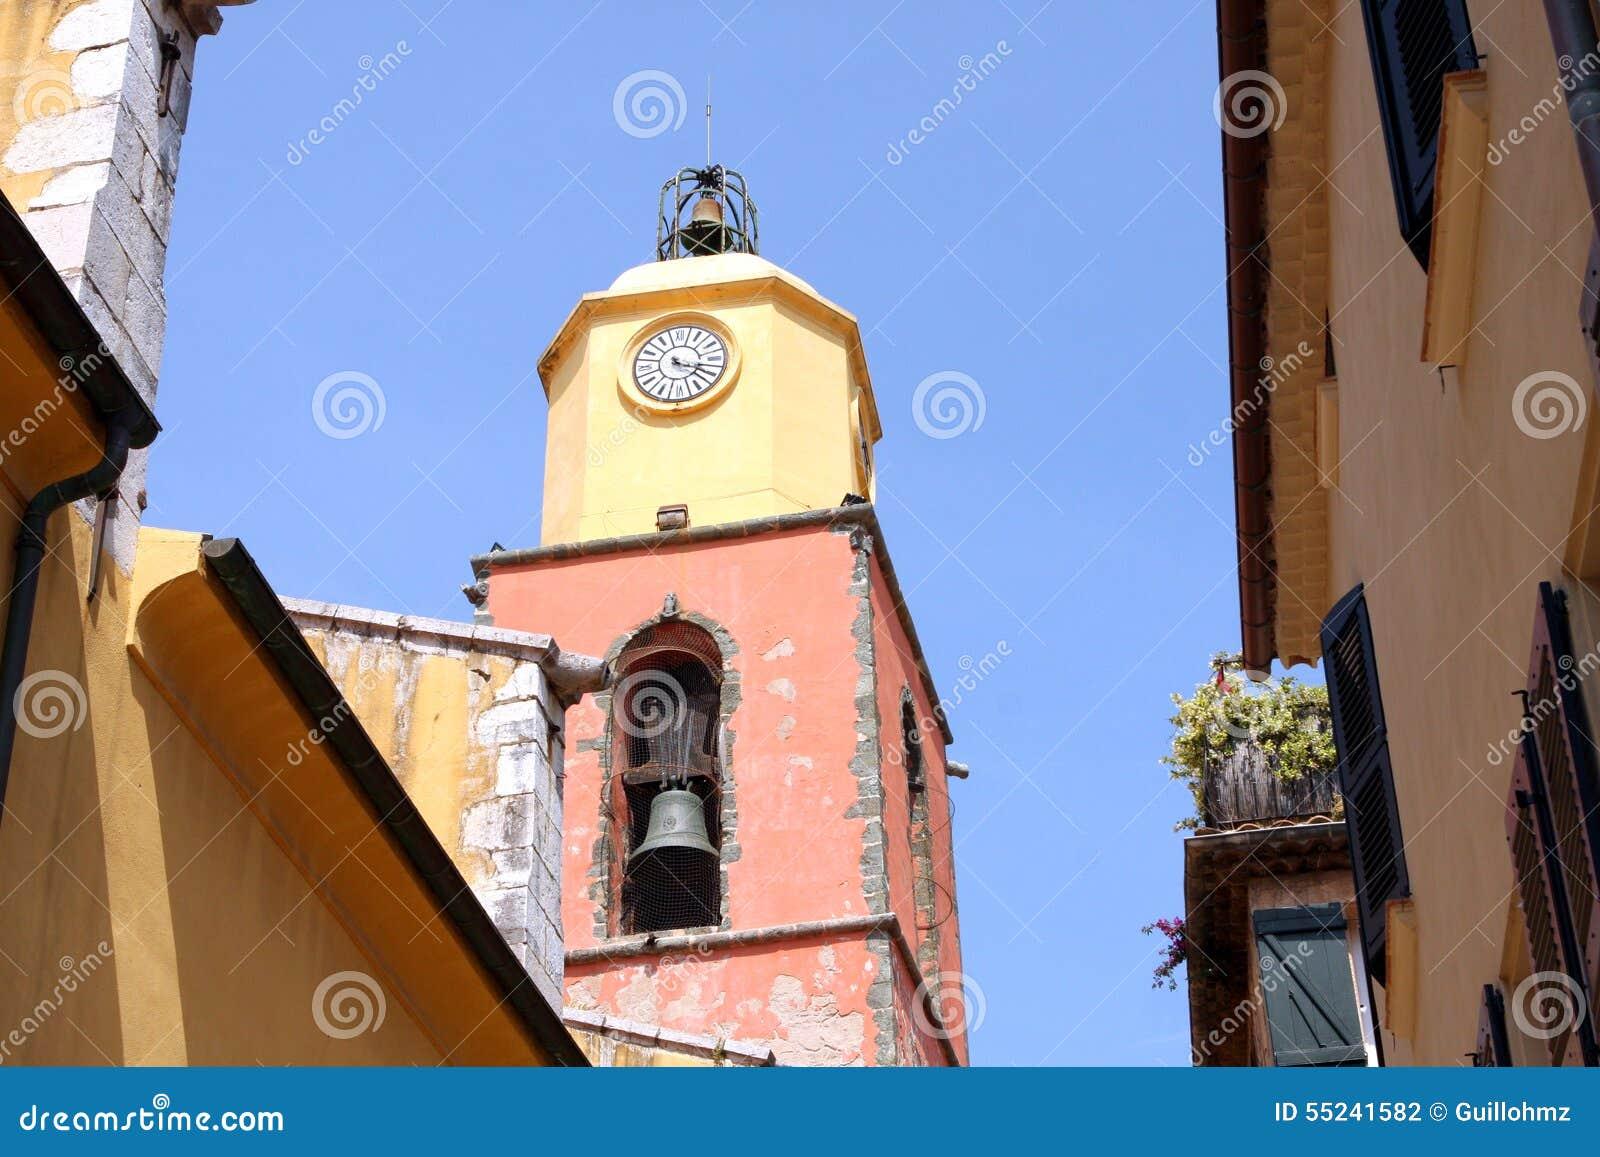 Saint-Tropez Provencal Bell tower church France